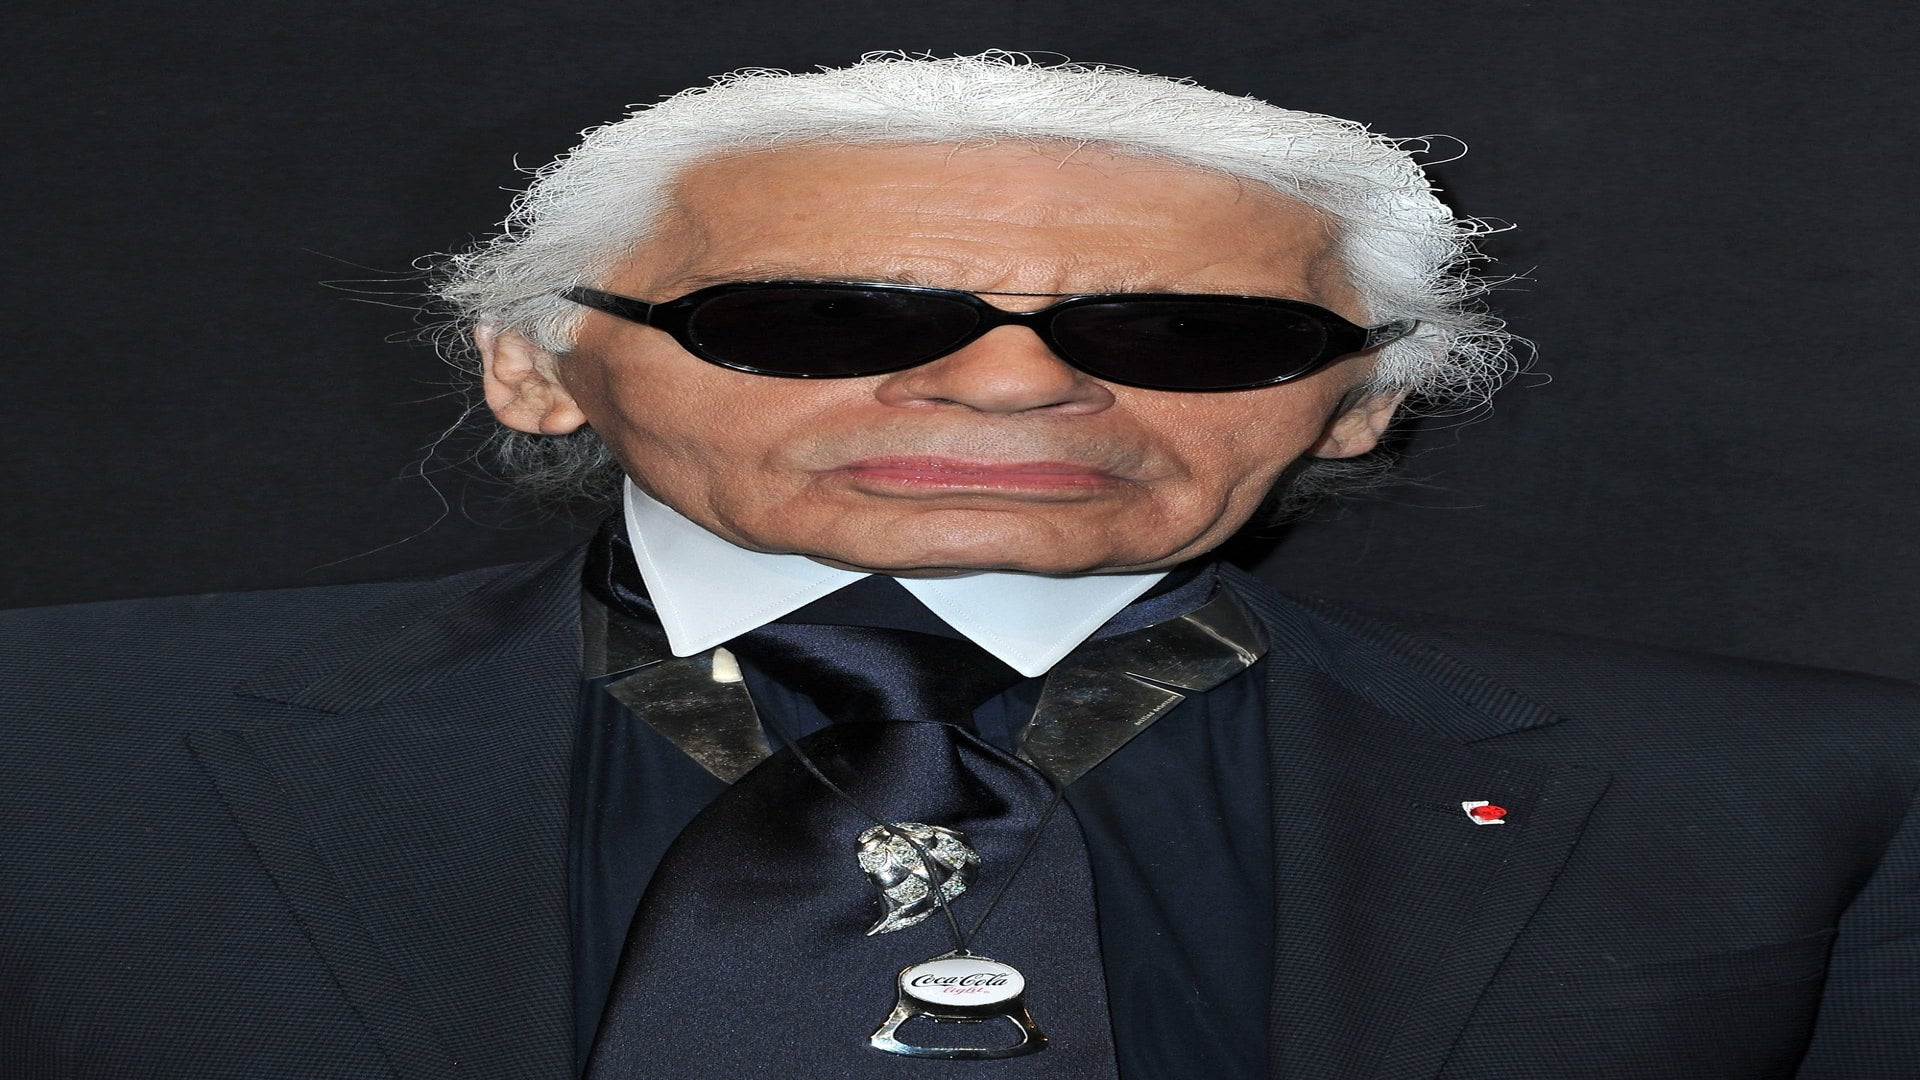 Karl Lagerfeld Dies At 85: Stars Remember The Legendary Fashion Designer